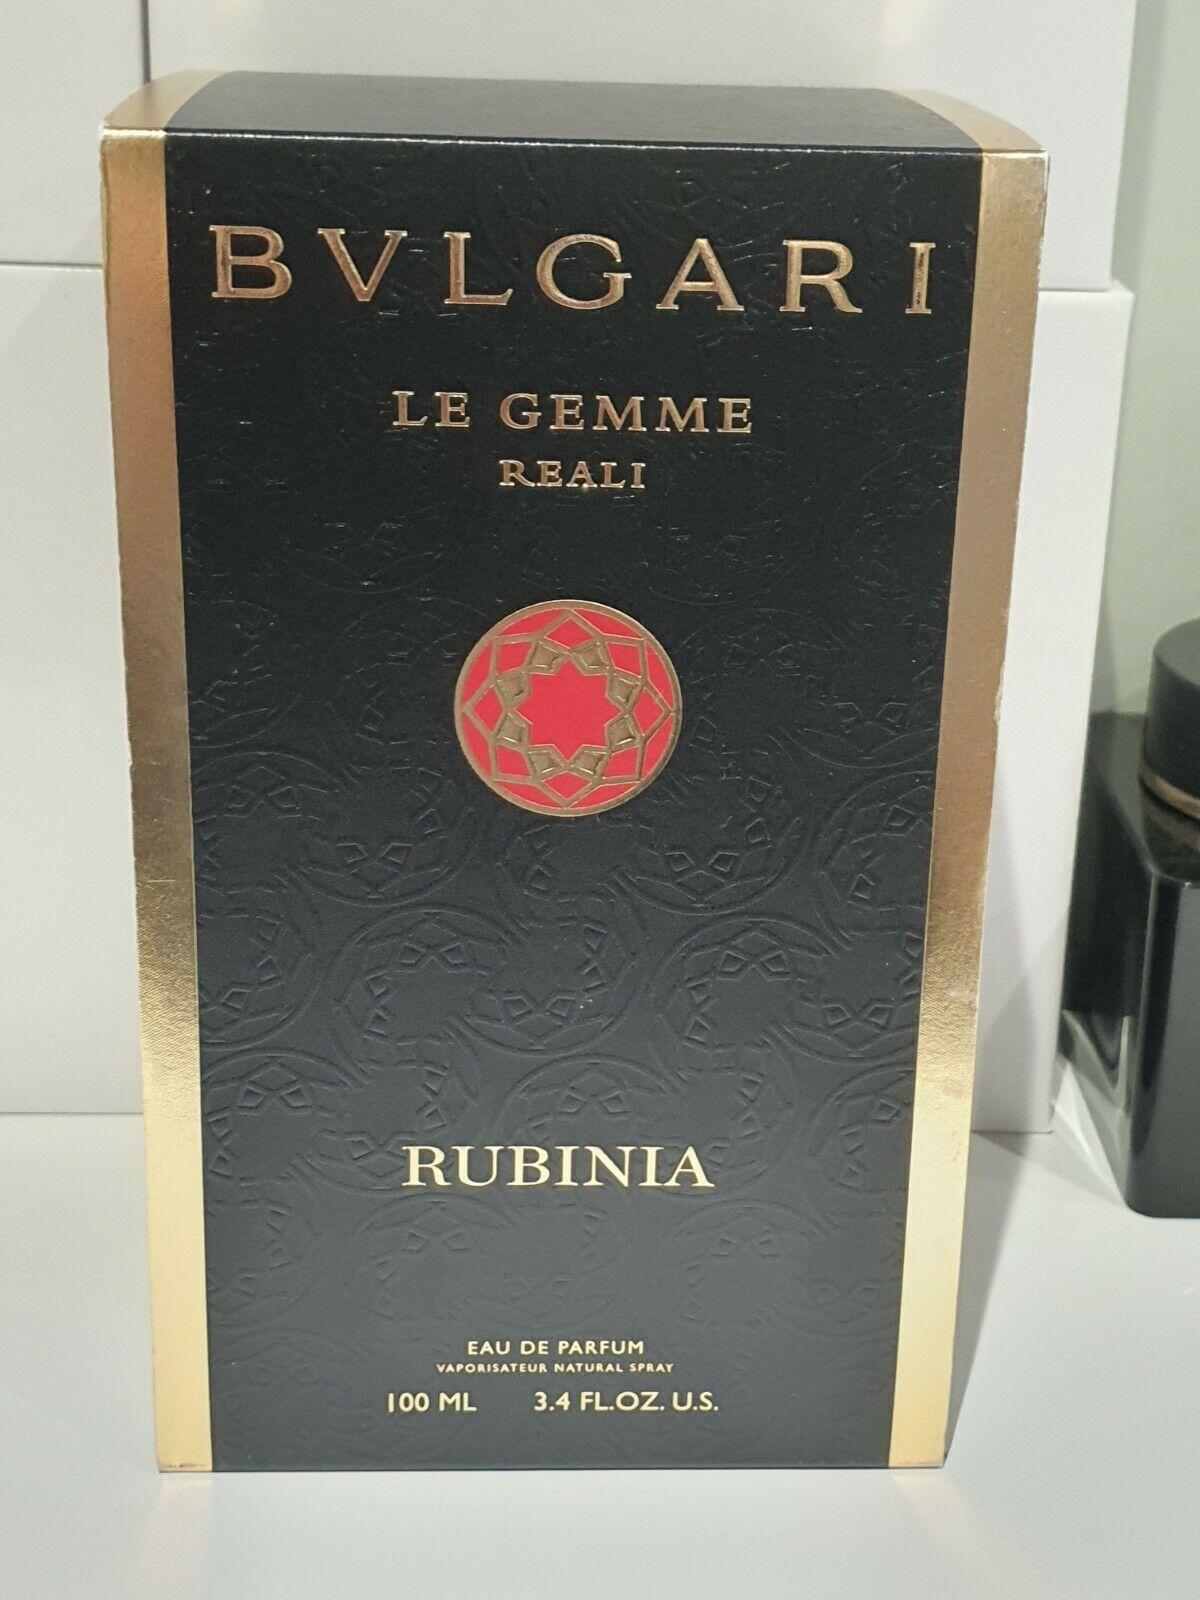 Bvlgari Le Gemme Reali Rubinia, edp 100ml